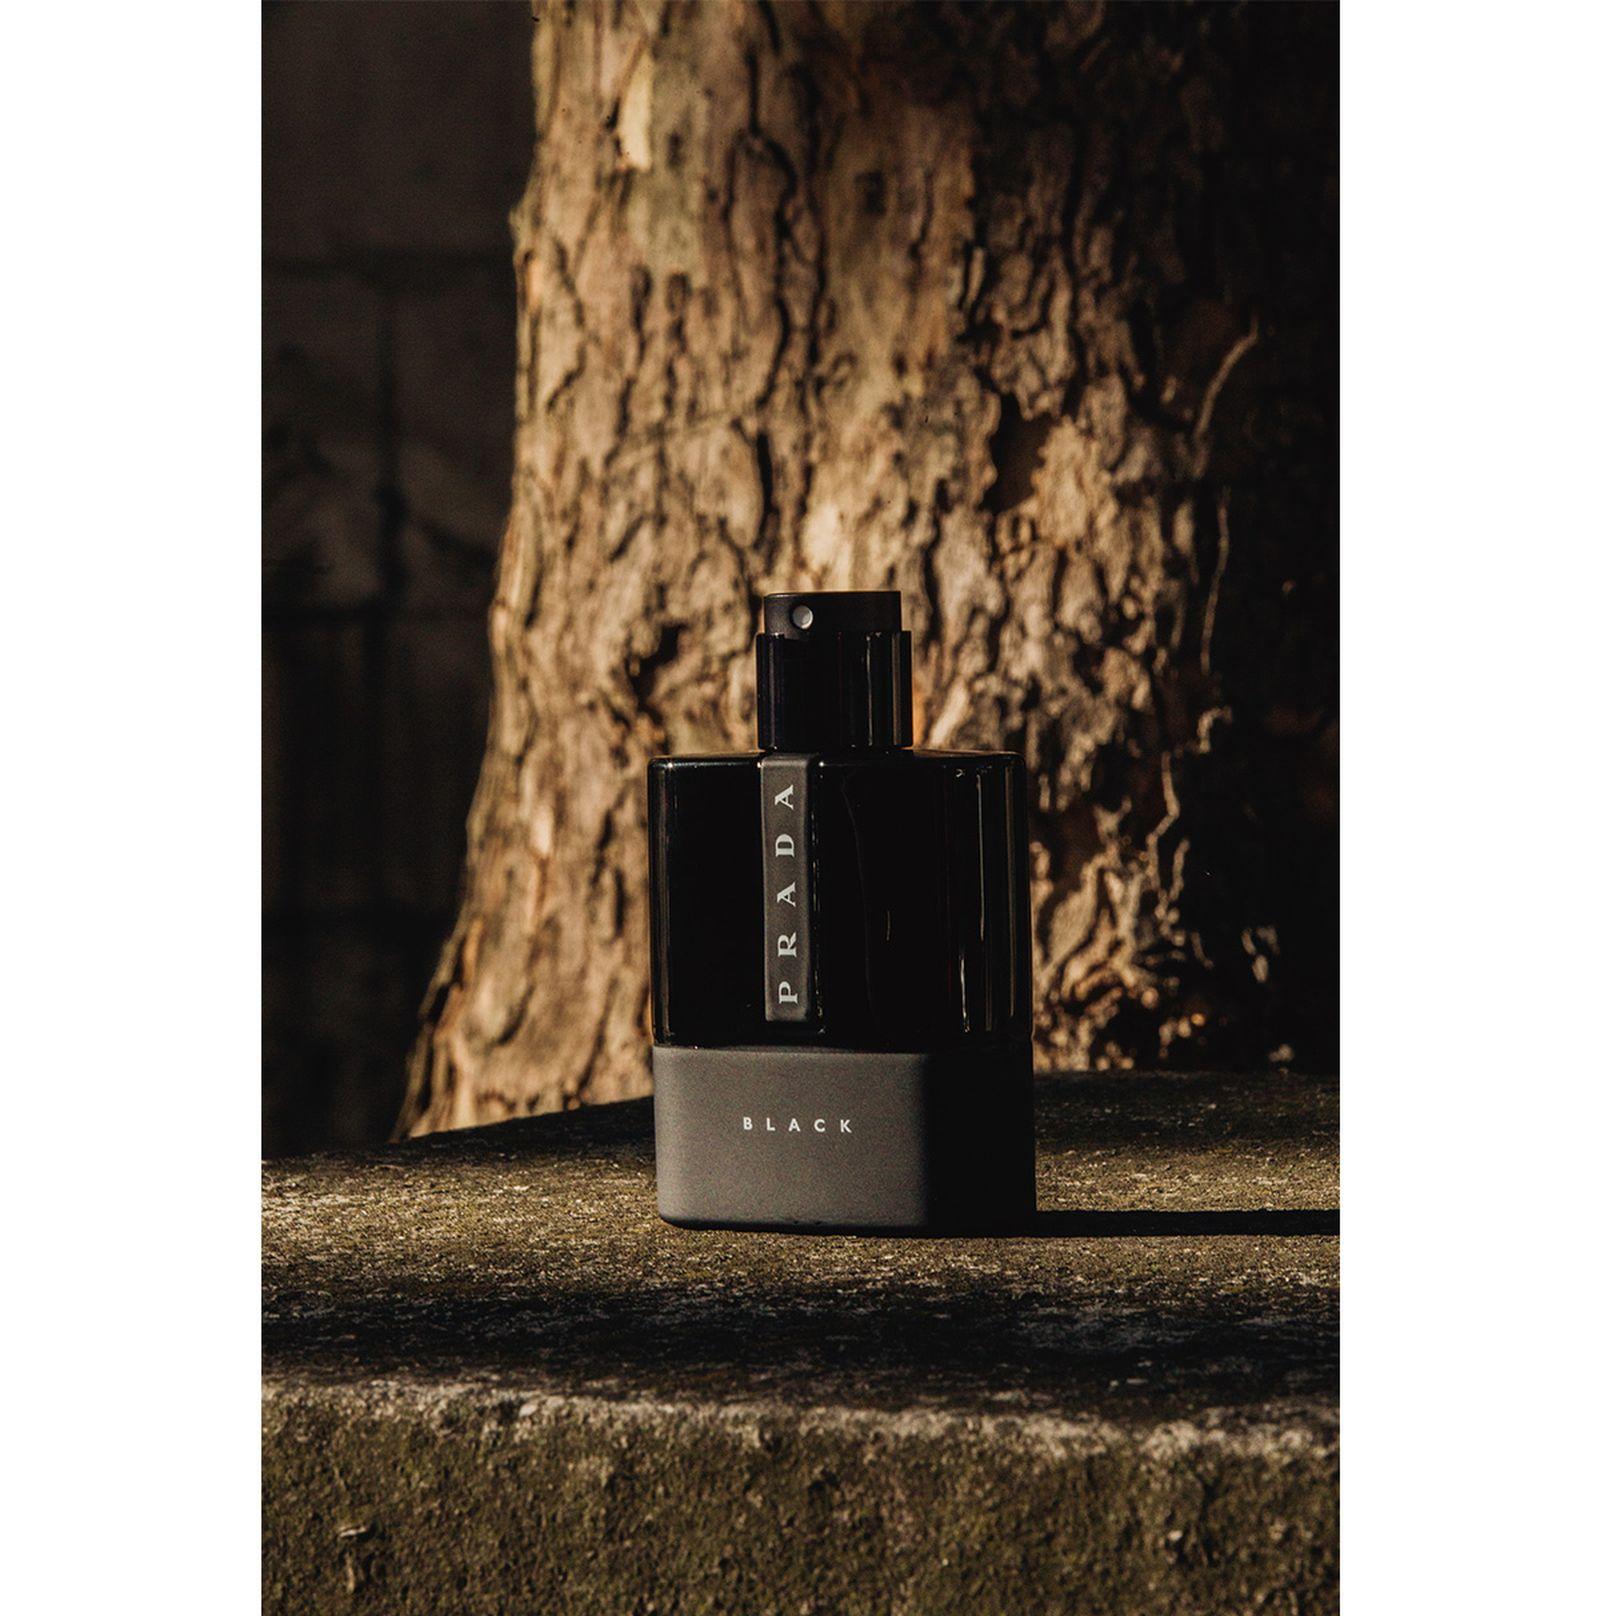 prada-black-fragrance-urban-exploration-3